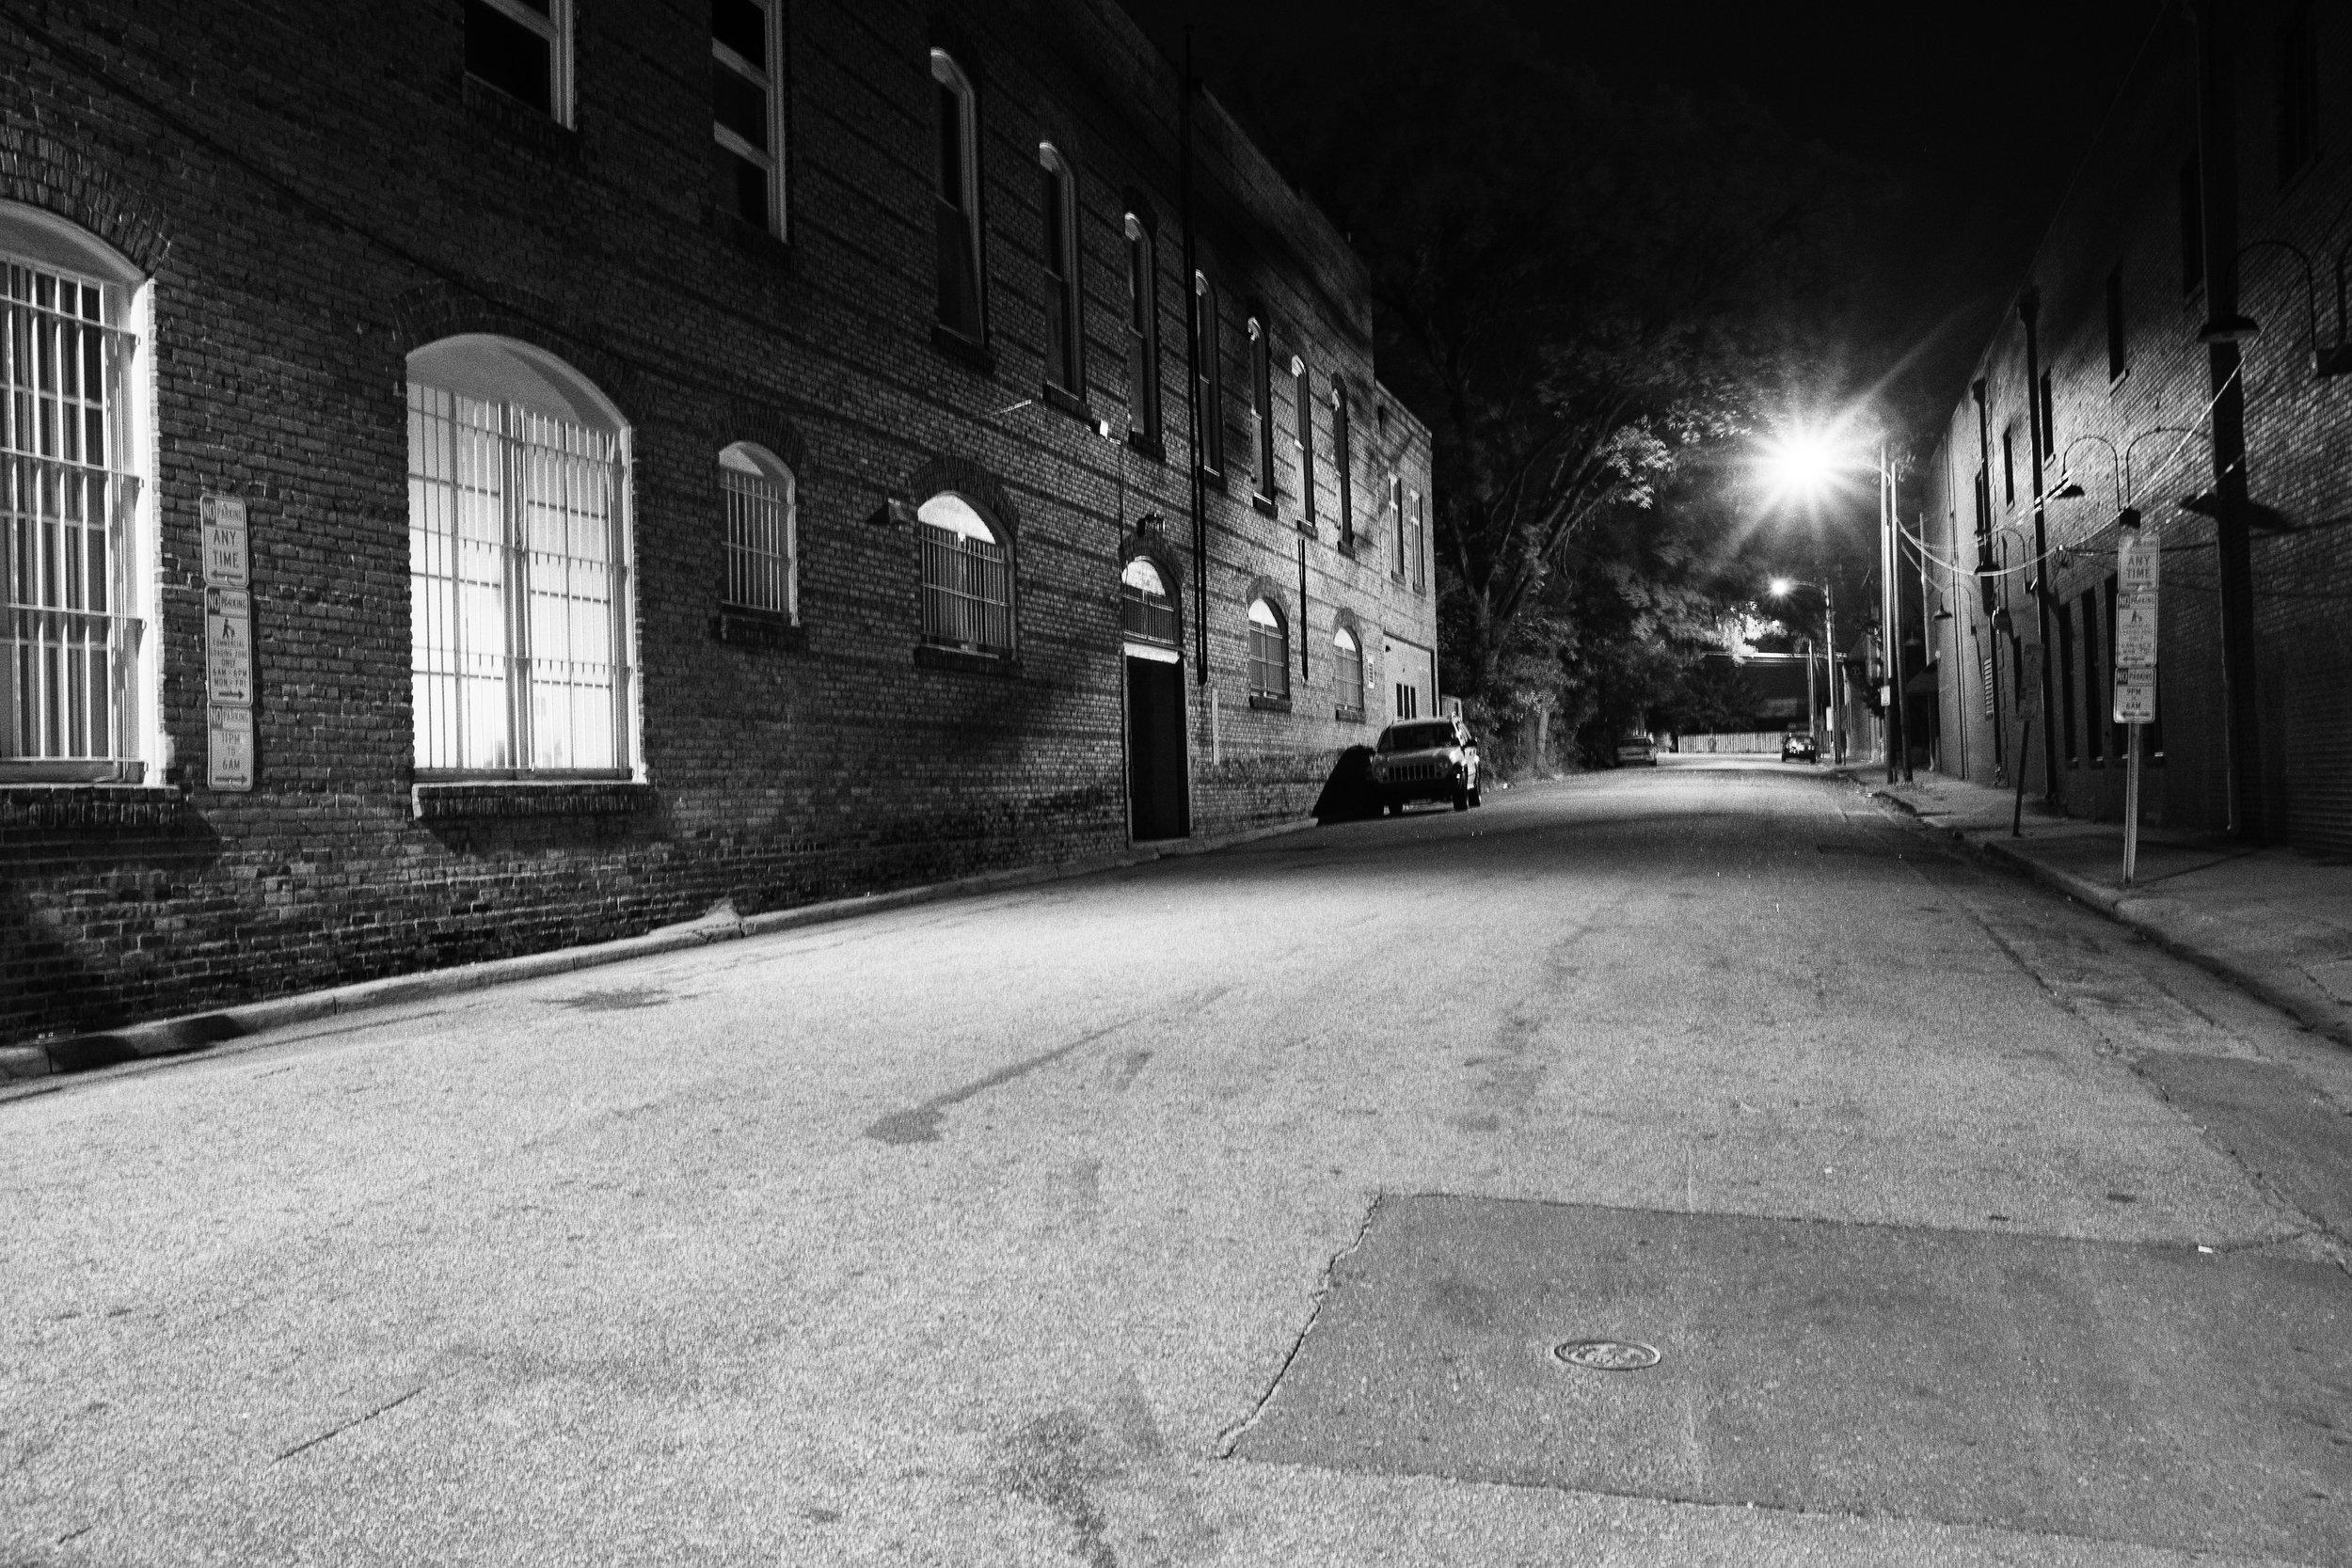 downtown-20141026-DSC02189-Edit.jpg